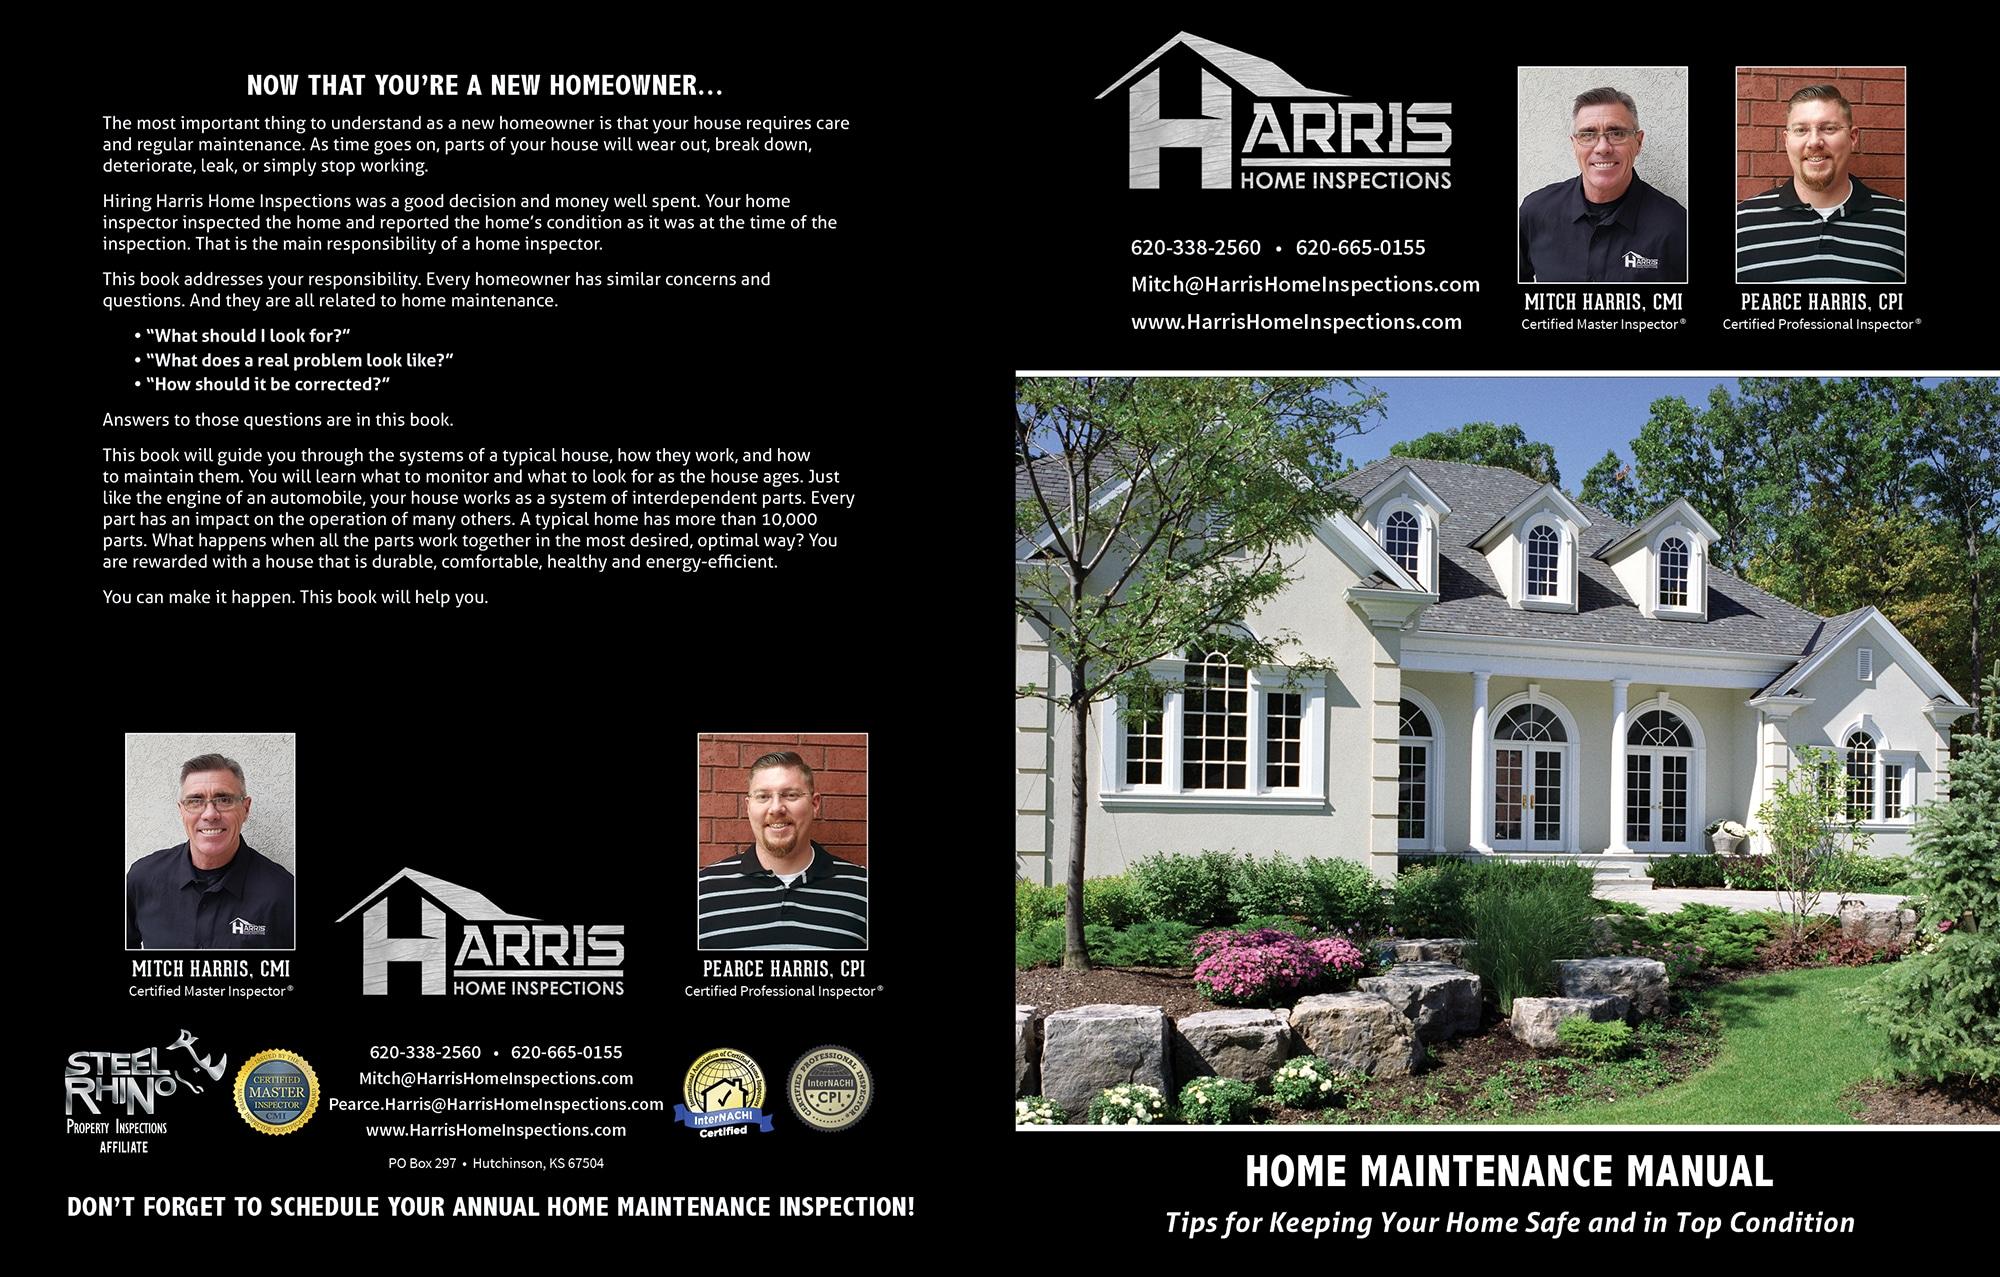 Custom Home Maintenance Book for Harris Home Inspections.